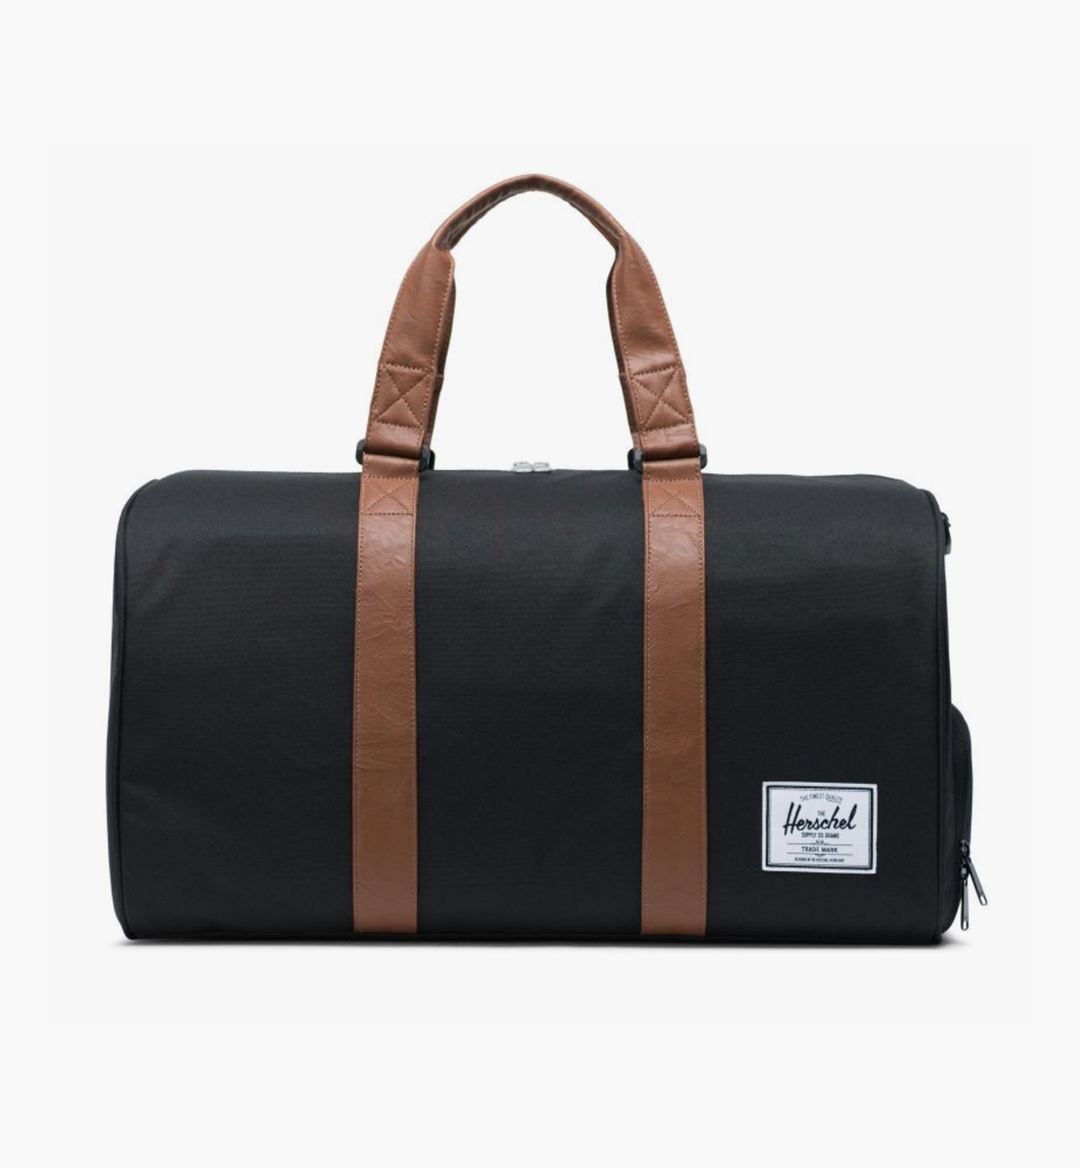 duffle bags mobile